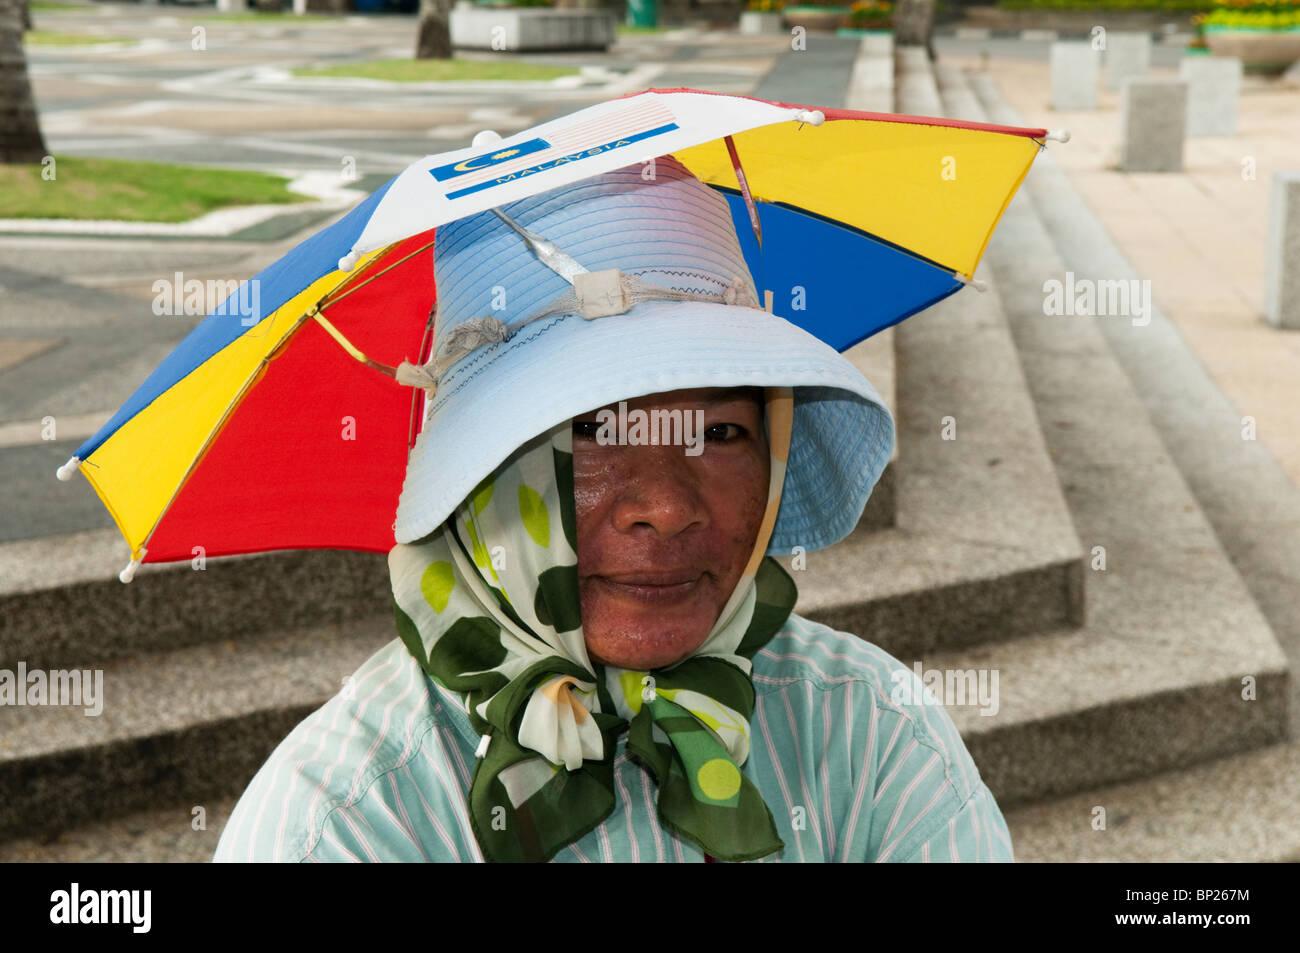 077d15c30b249 Woman with funny umbrella hat by Masjid Negara in Kuala Lumpur Stock ...